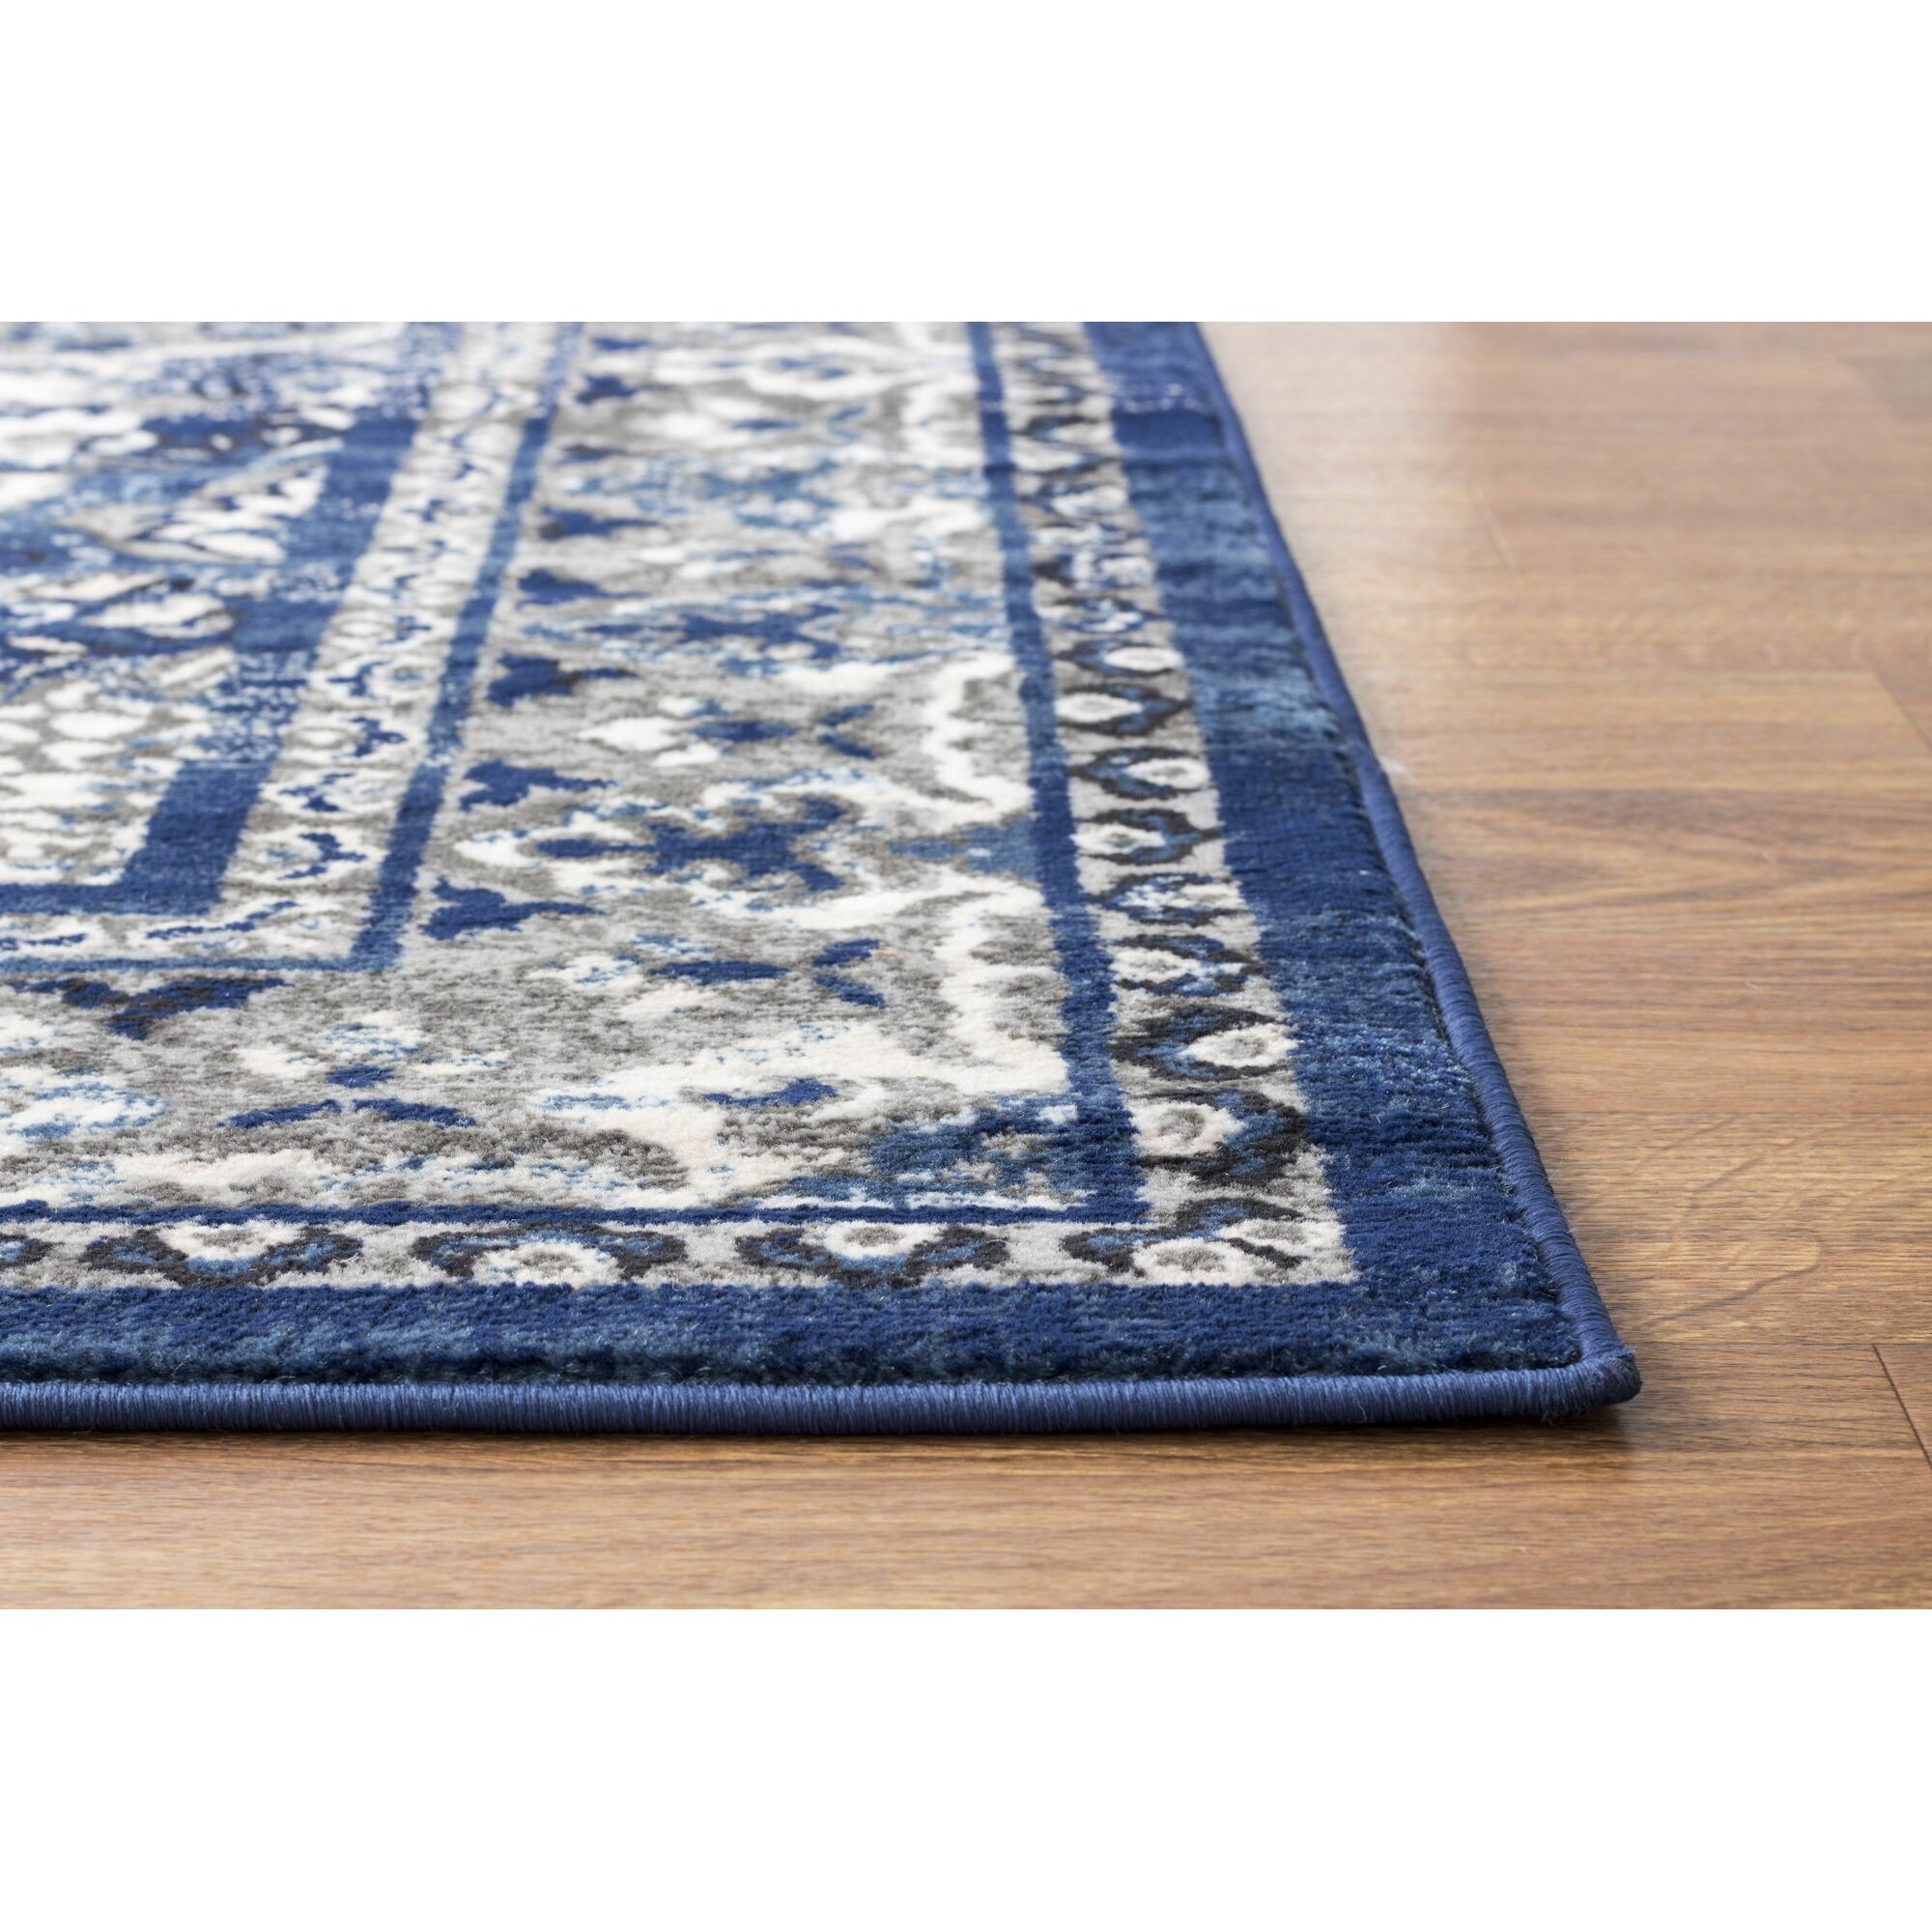 super area rugs artifact blue gray area rug wayfair. Black Bedroom Furniture Sets. Home Design Ideas